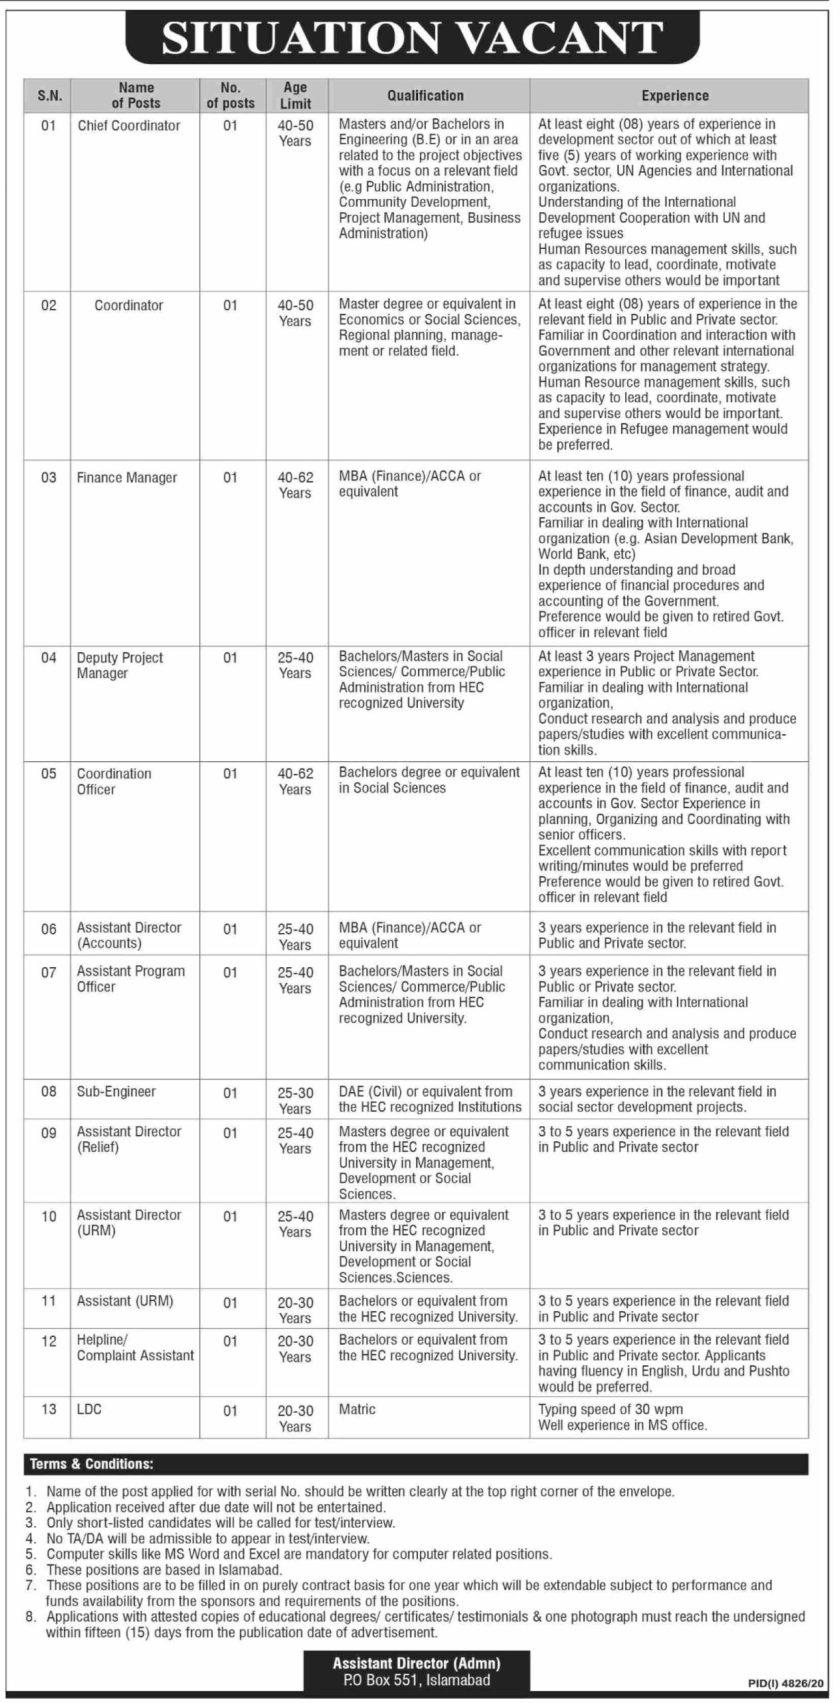 Public Sector Organization PO Box 551 Islamabad Jobs 2021